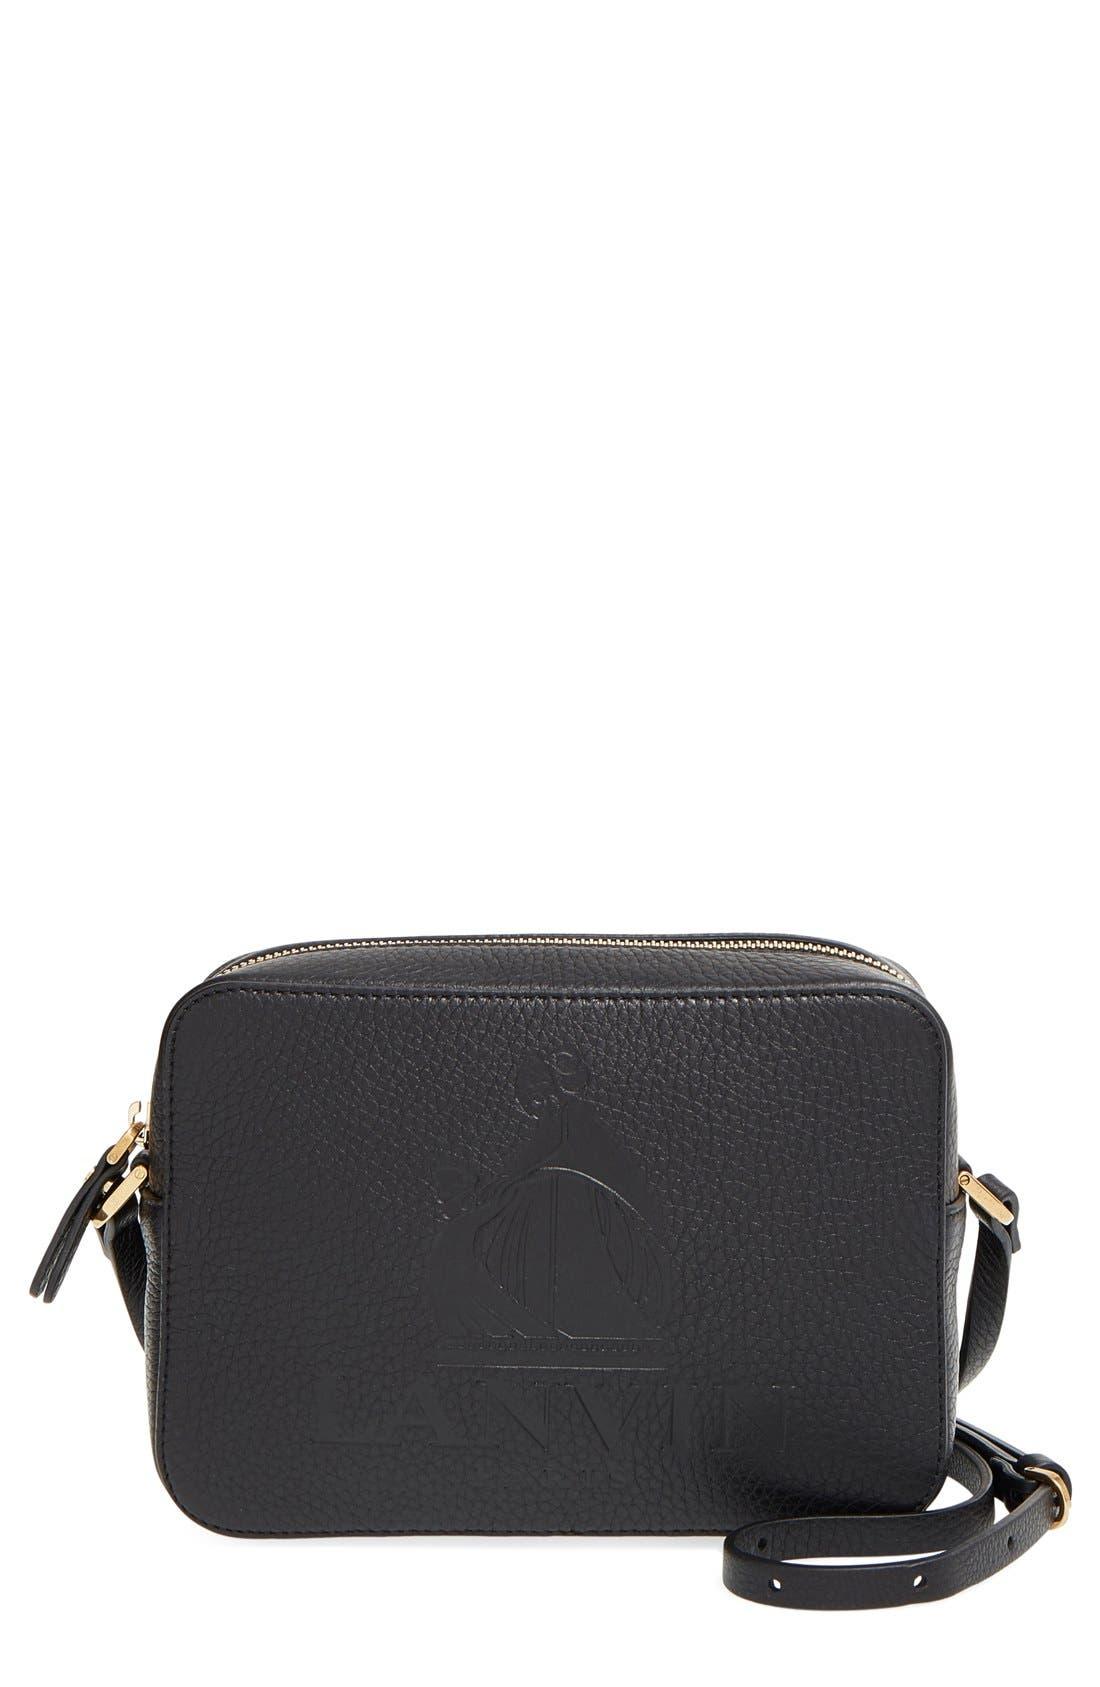 'Nomad' Leather Camera Bag, Main, color, 001